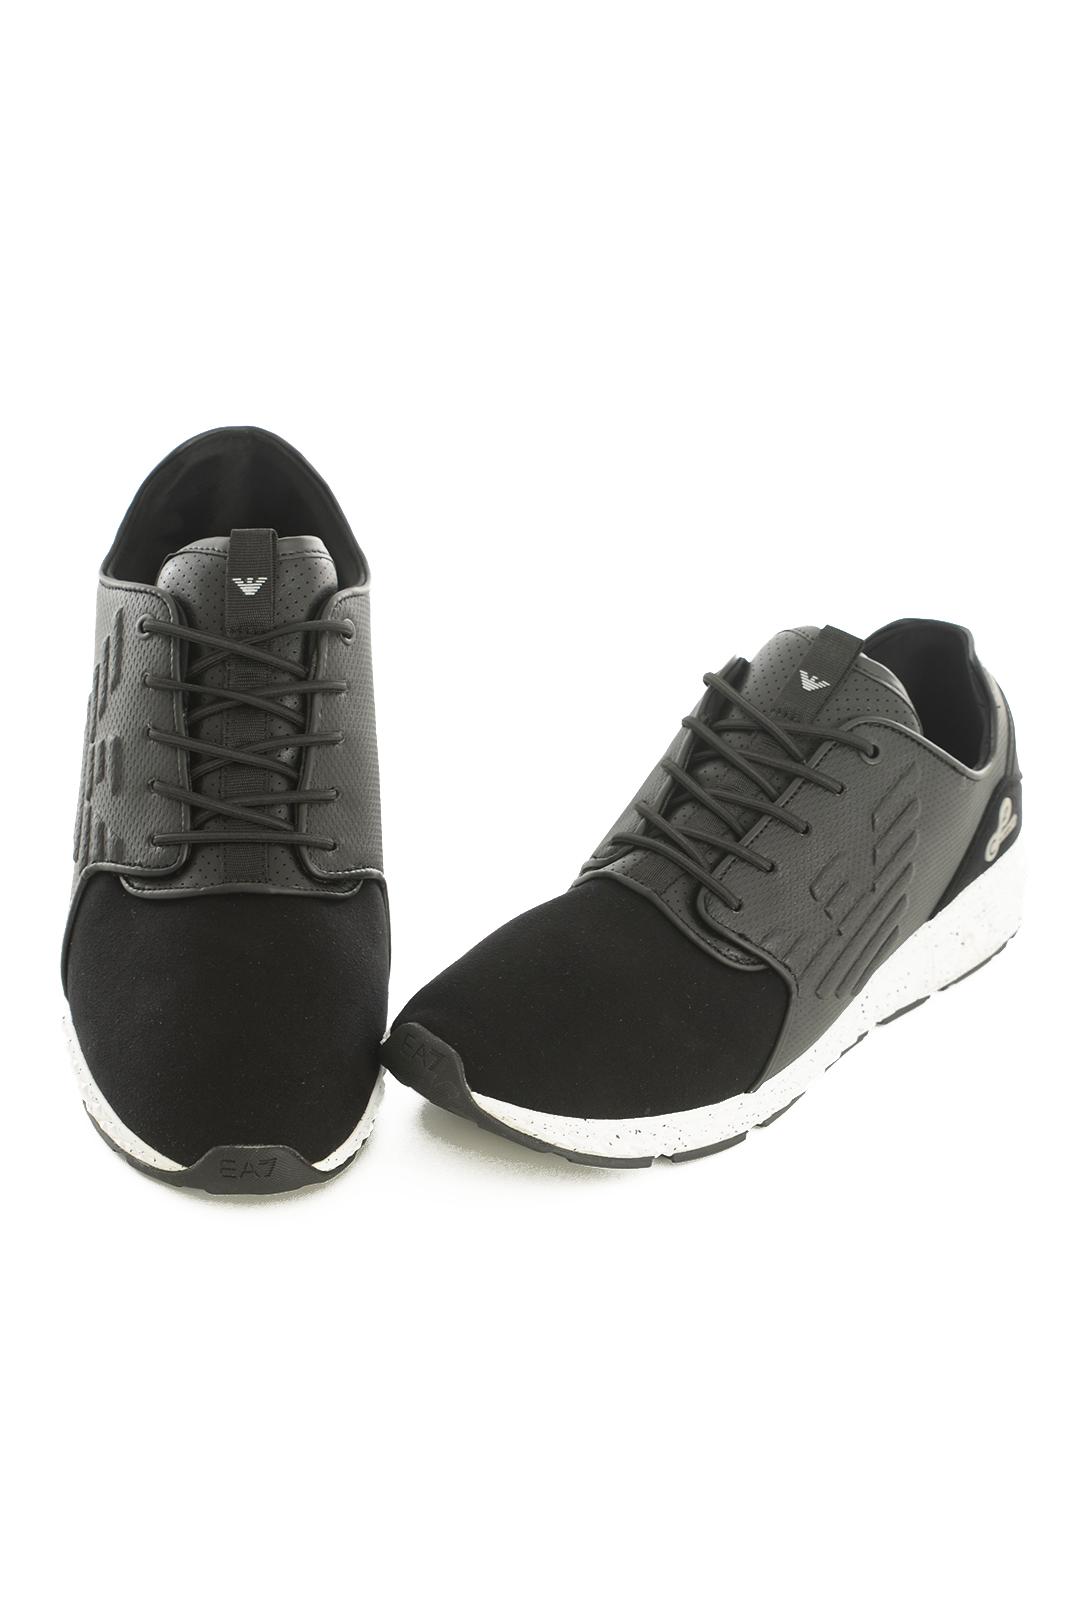 Chaussures   Emporio armani 248016 7A268 020 NOIR